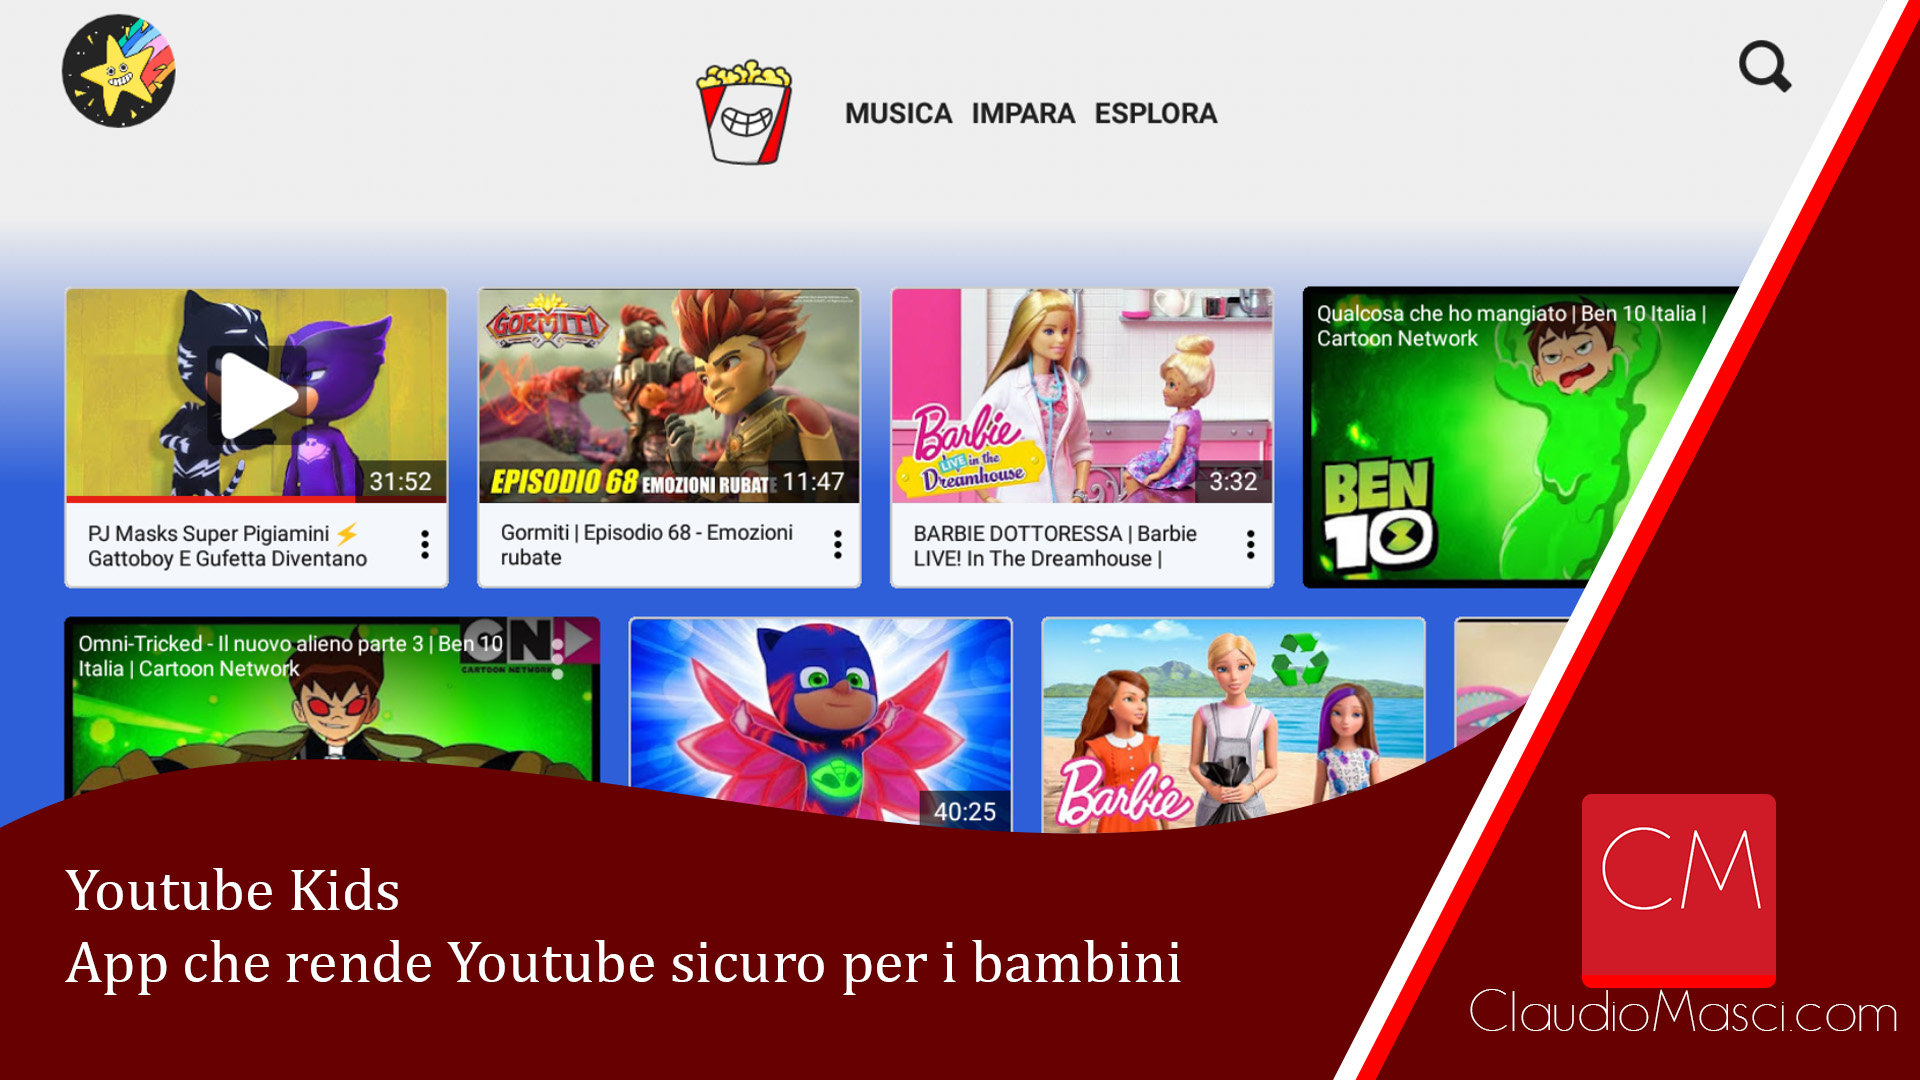 Youtube Kids – App che rende Youtube sicuro per i bambini